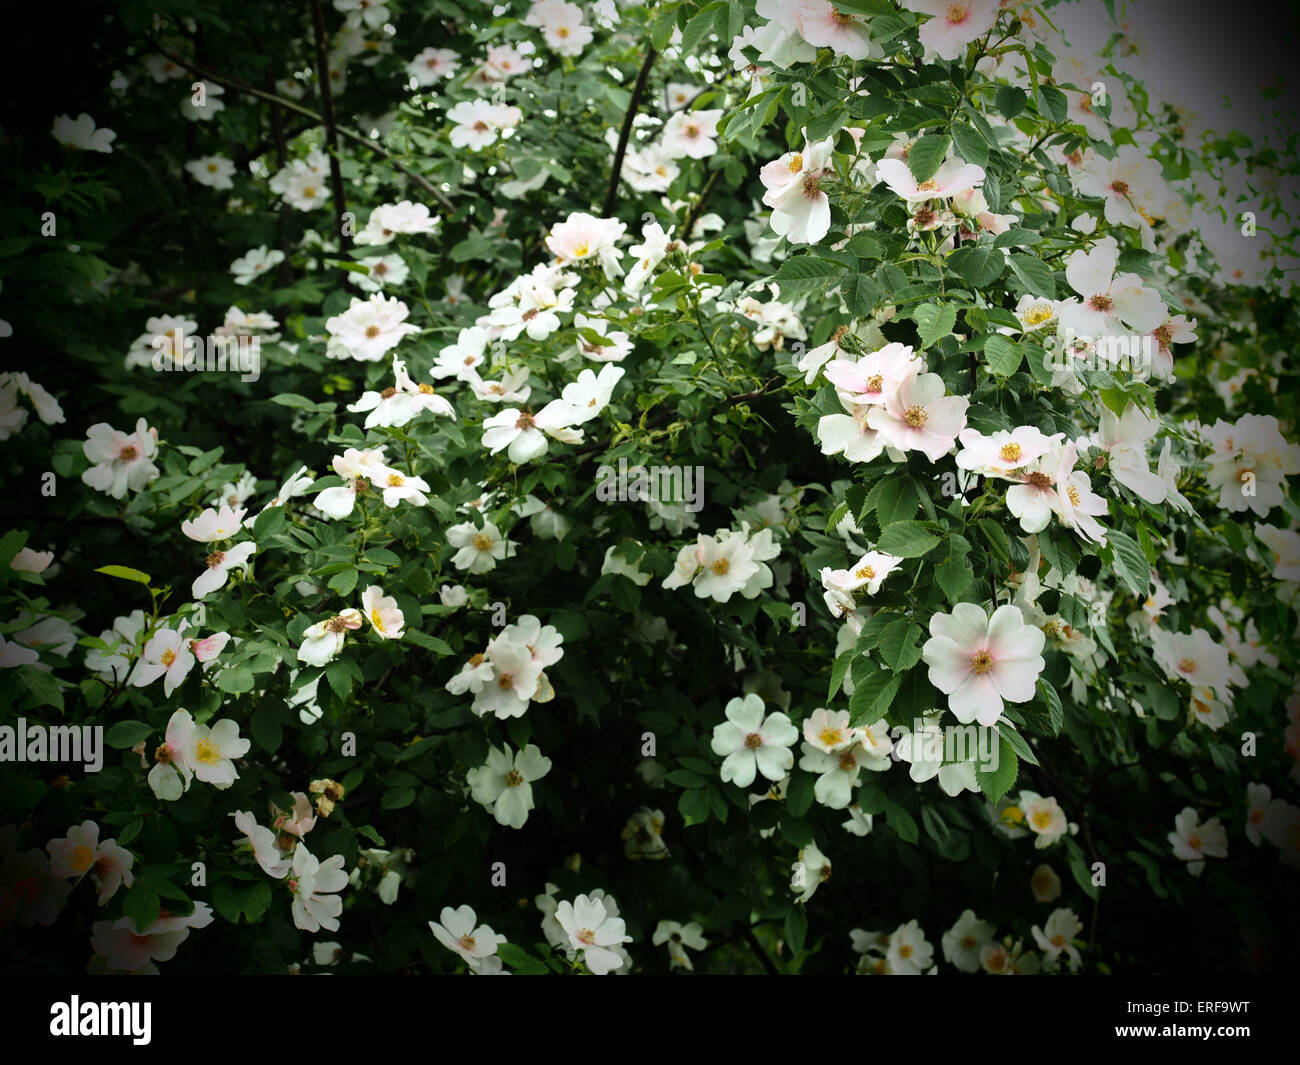 Flowering Shrub White Flowers 2nd Stock Photos Flowering Shrub